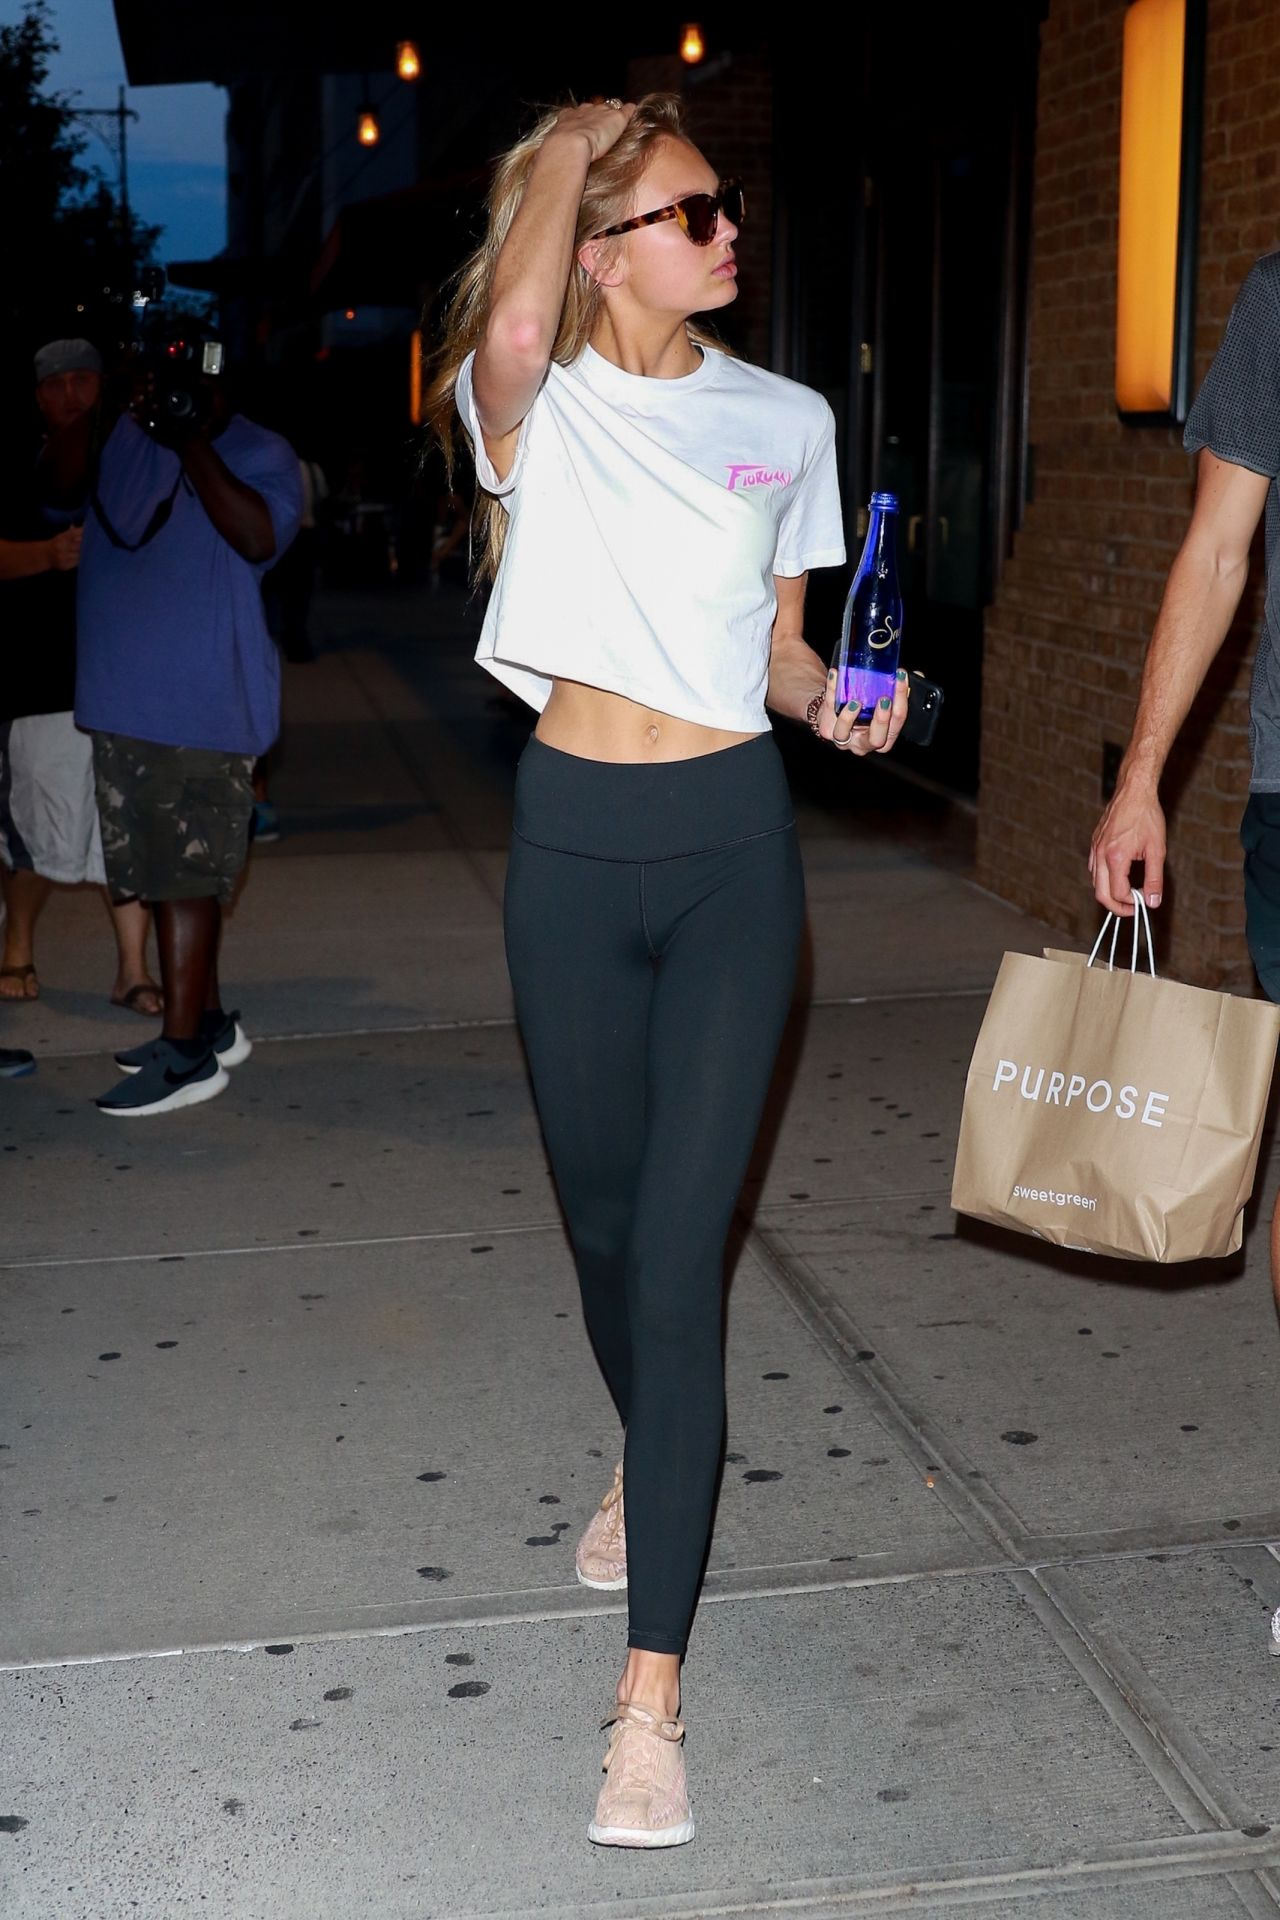 Romee strijd in tights walks with her boyfriend in new york